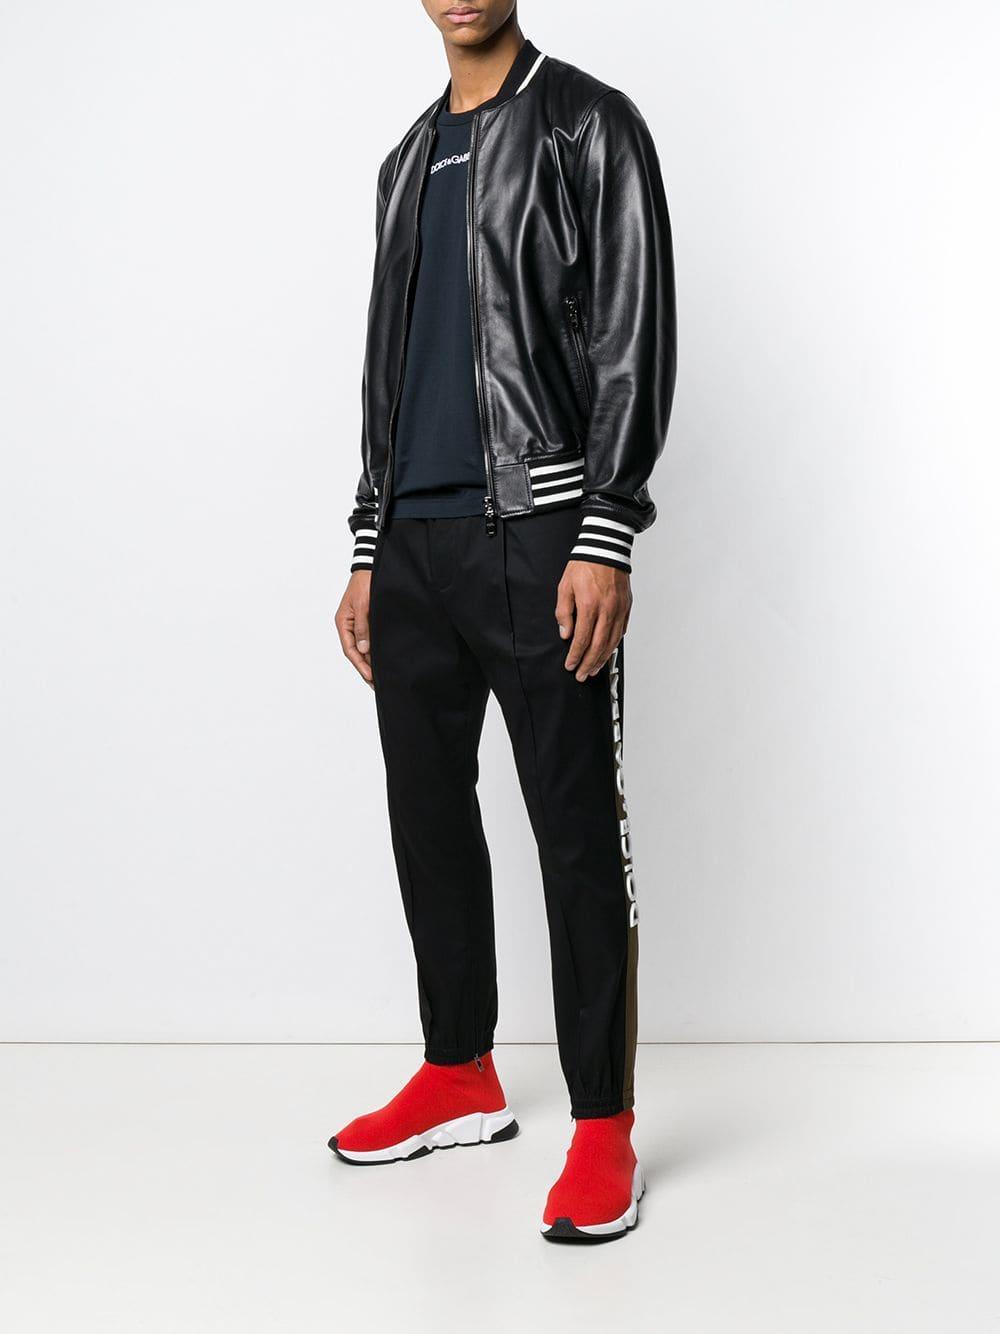 ddbf2a8b75 Lyst - Dolce   Gabbana Bomber Jacket in Black for Men